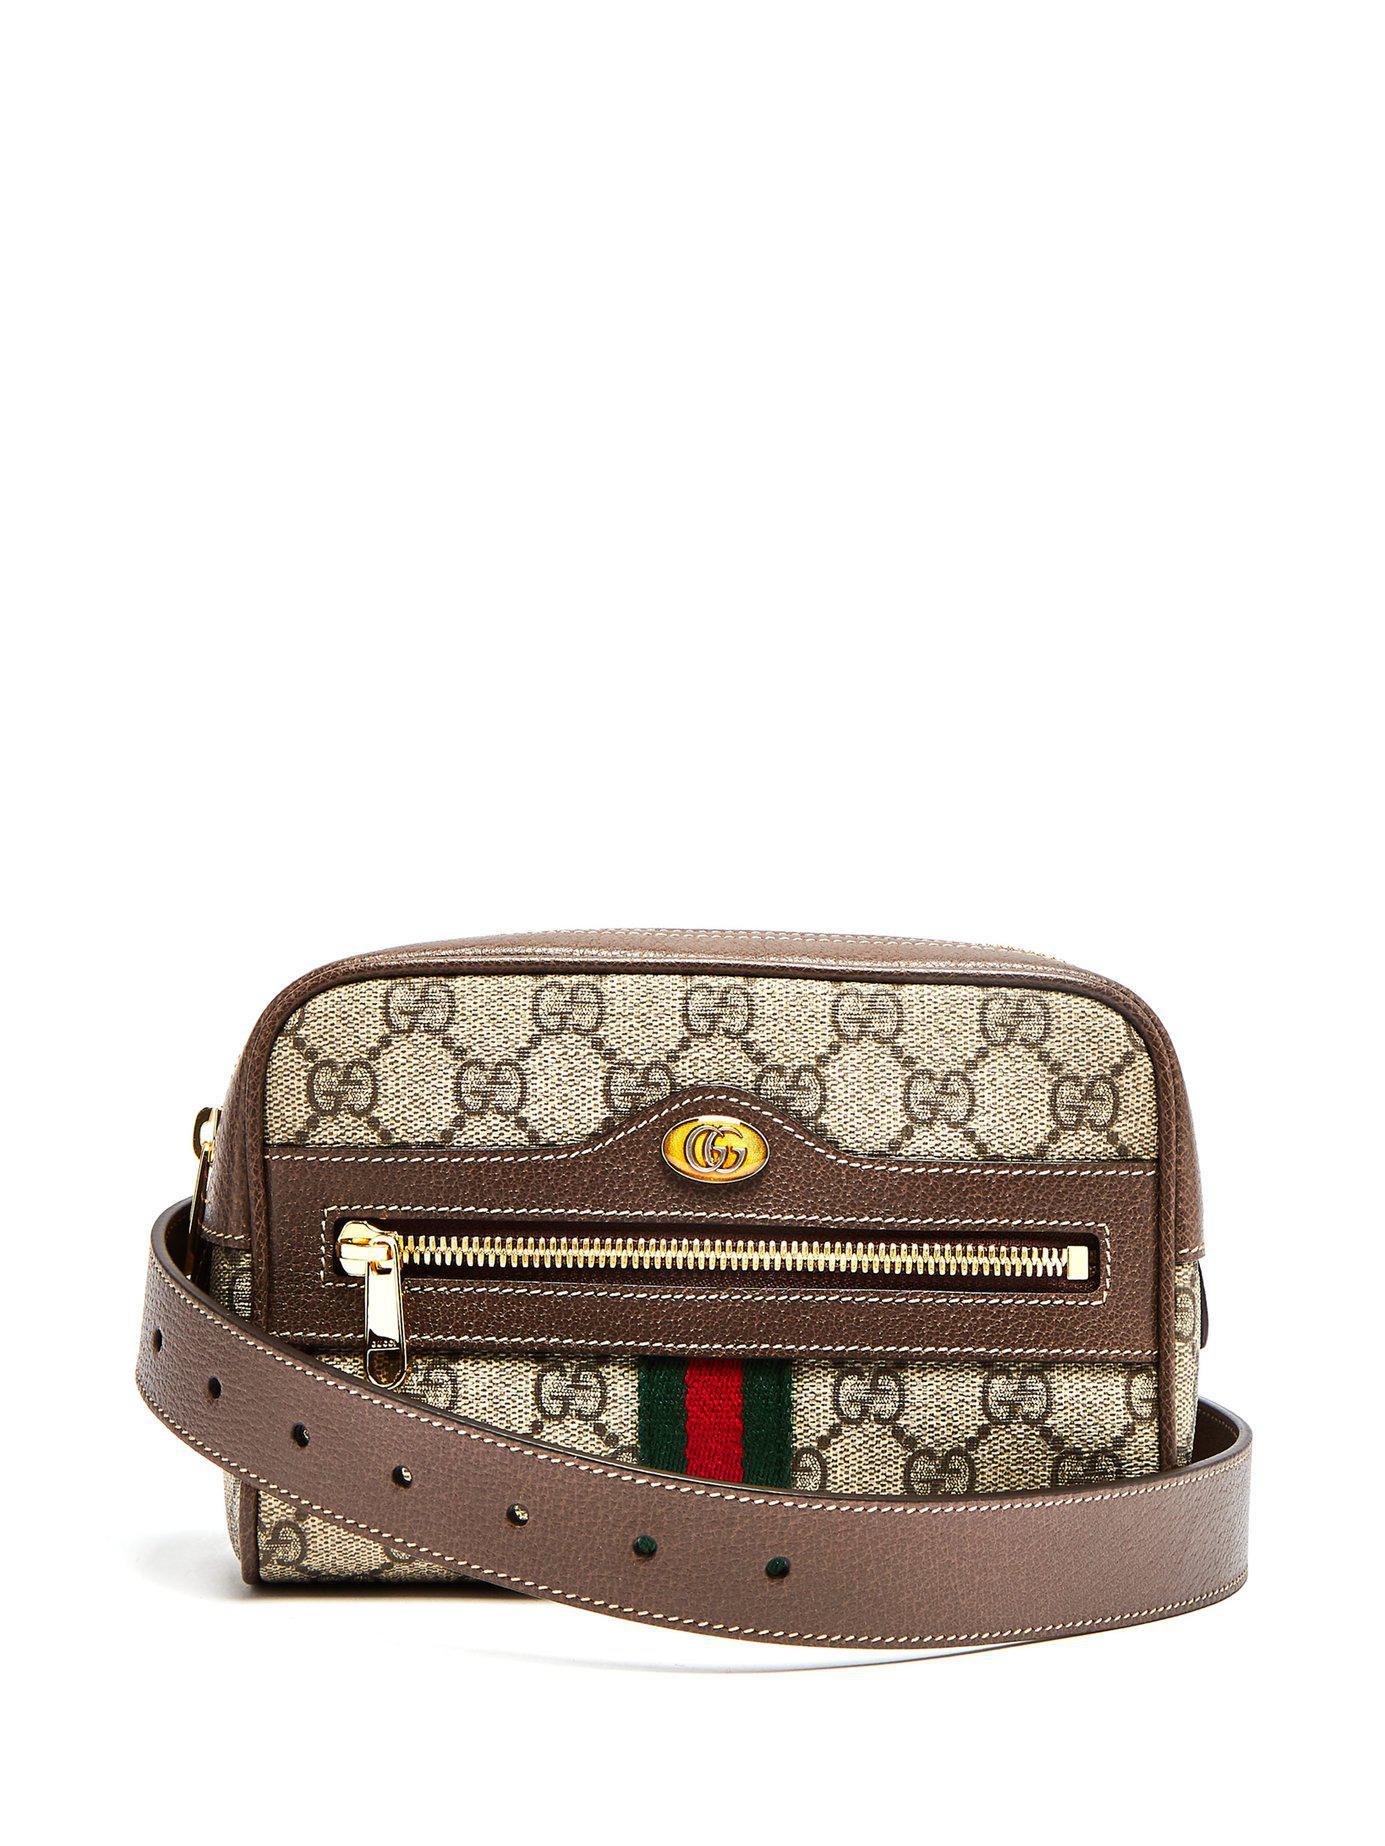 0f513f70e Gucci Ophidia Gg Supreme Belt Bag in Brown - Save 4% - Lyst